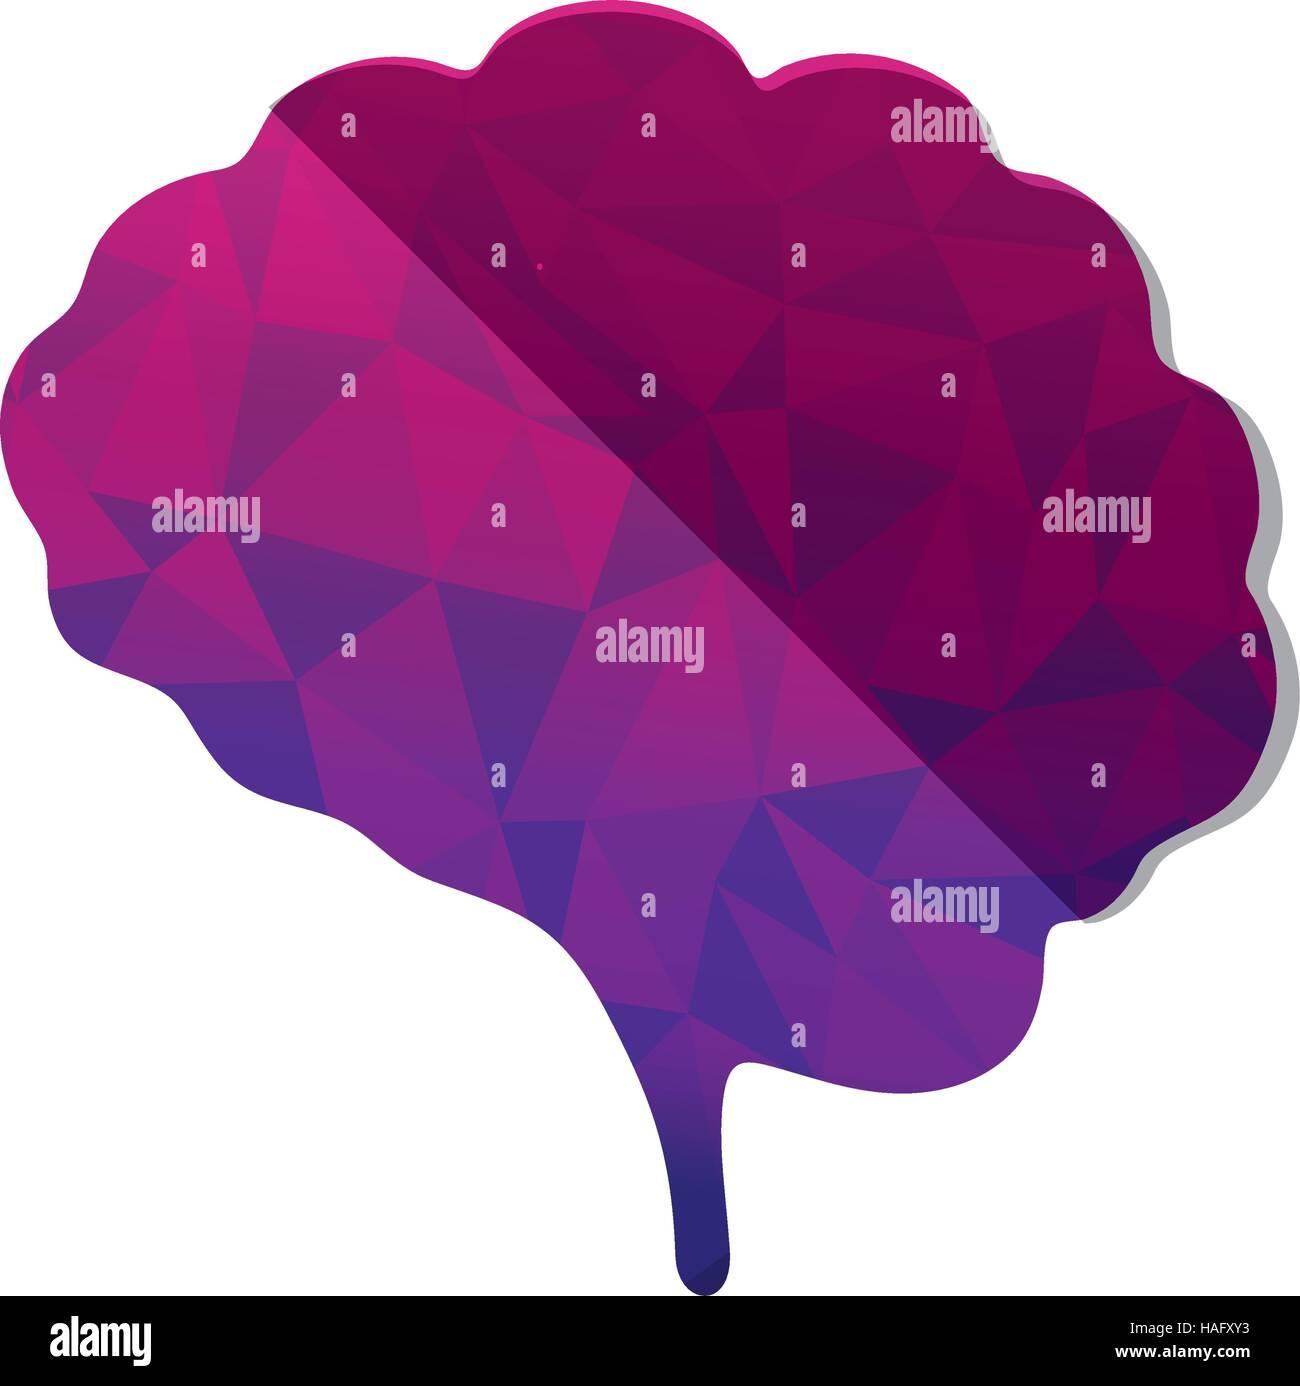 Human brain mind - Stock Image